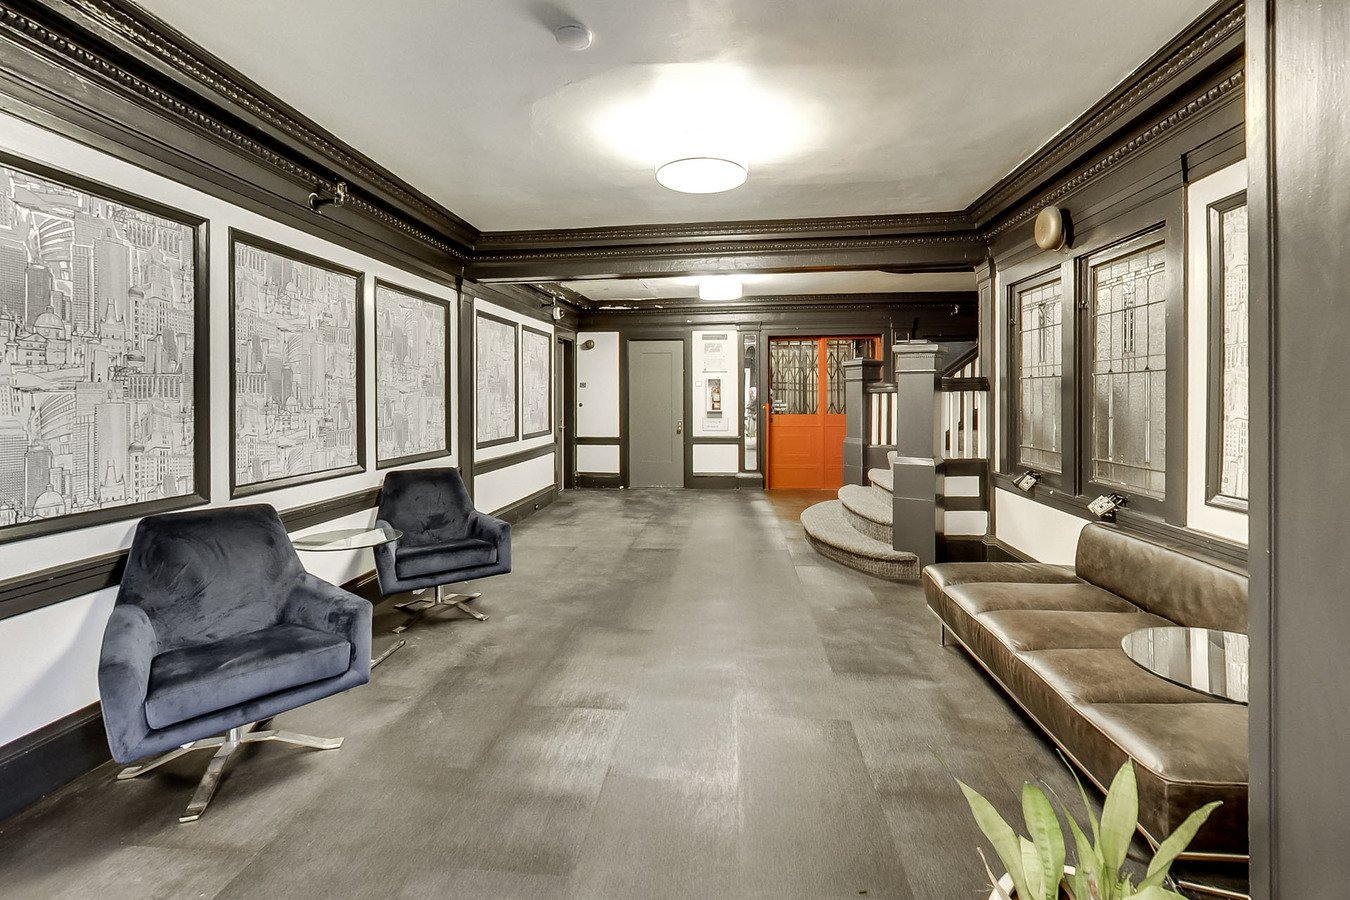 Studio 1 Bathroom Apartment for rent at 634 Powell Apartments in San Francisco, CA